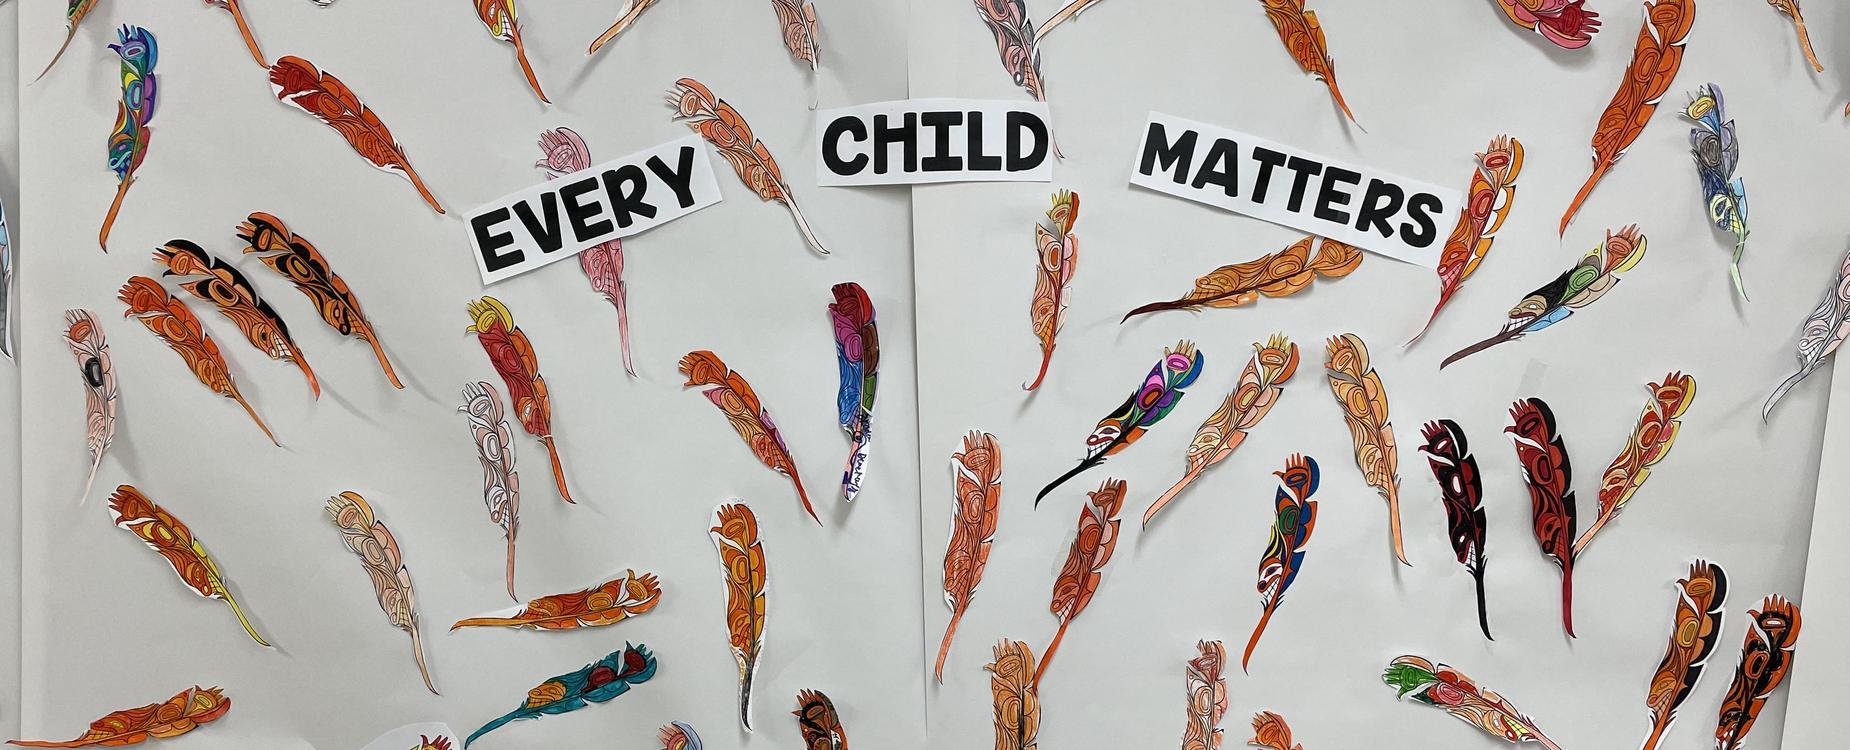 Every Child Matters bulletin board